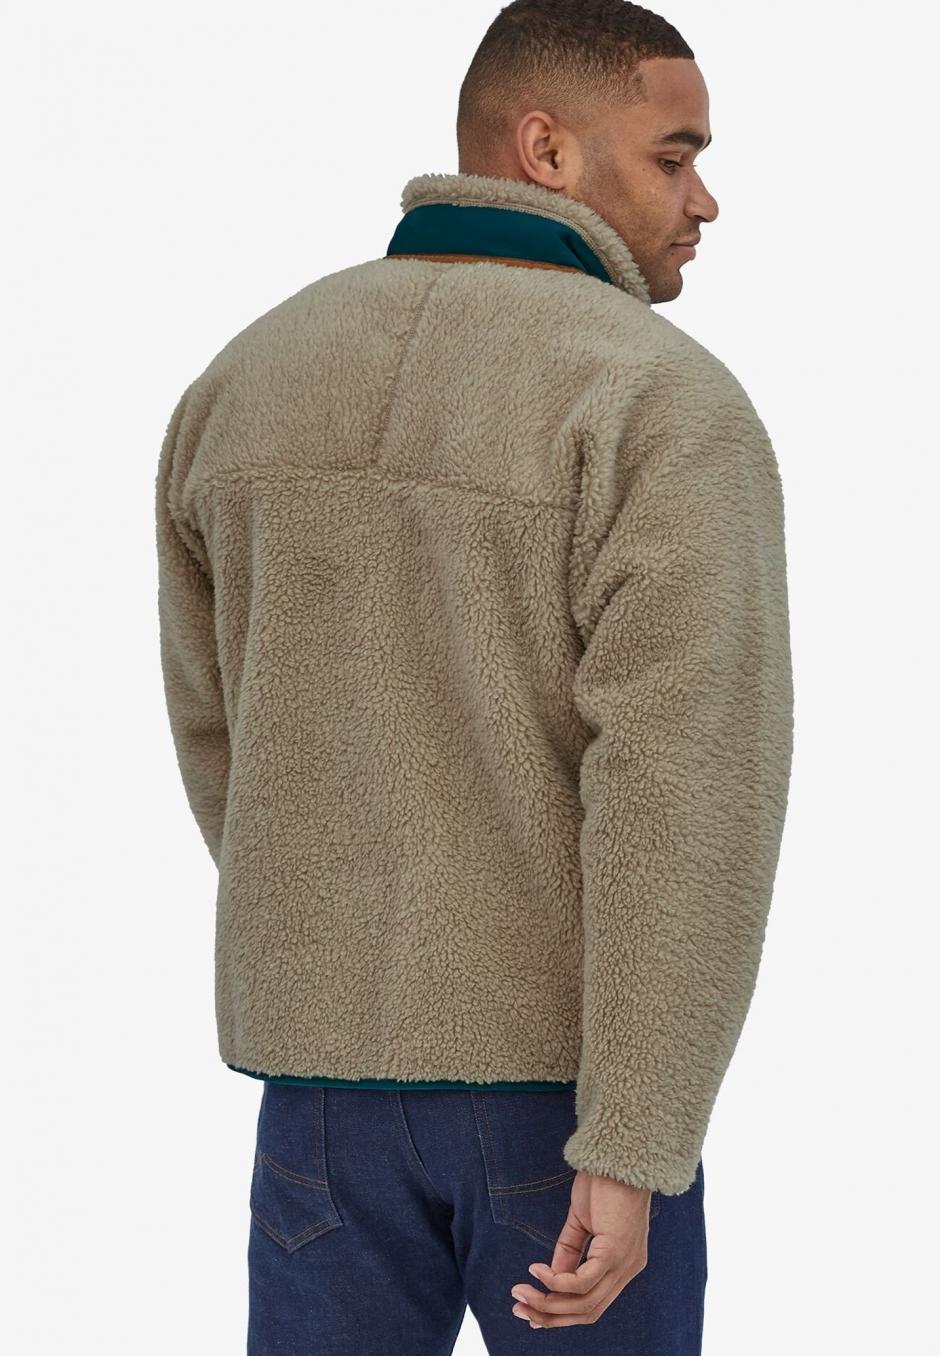 Patagonia M's Classic Retro-X Fleece Jacket